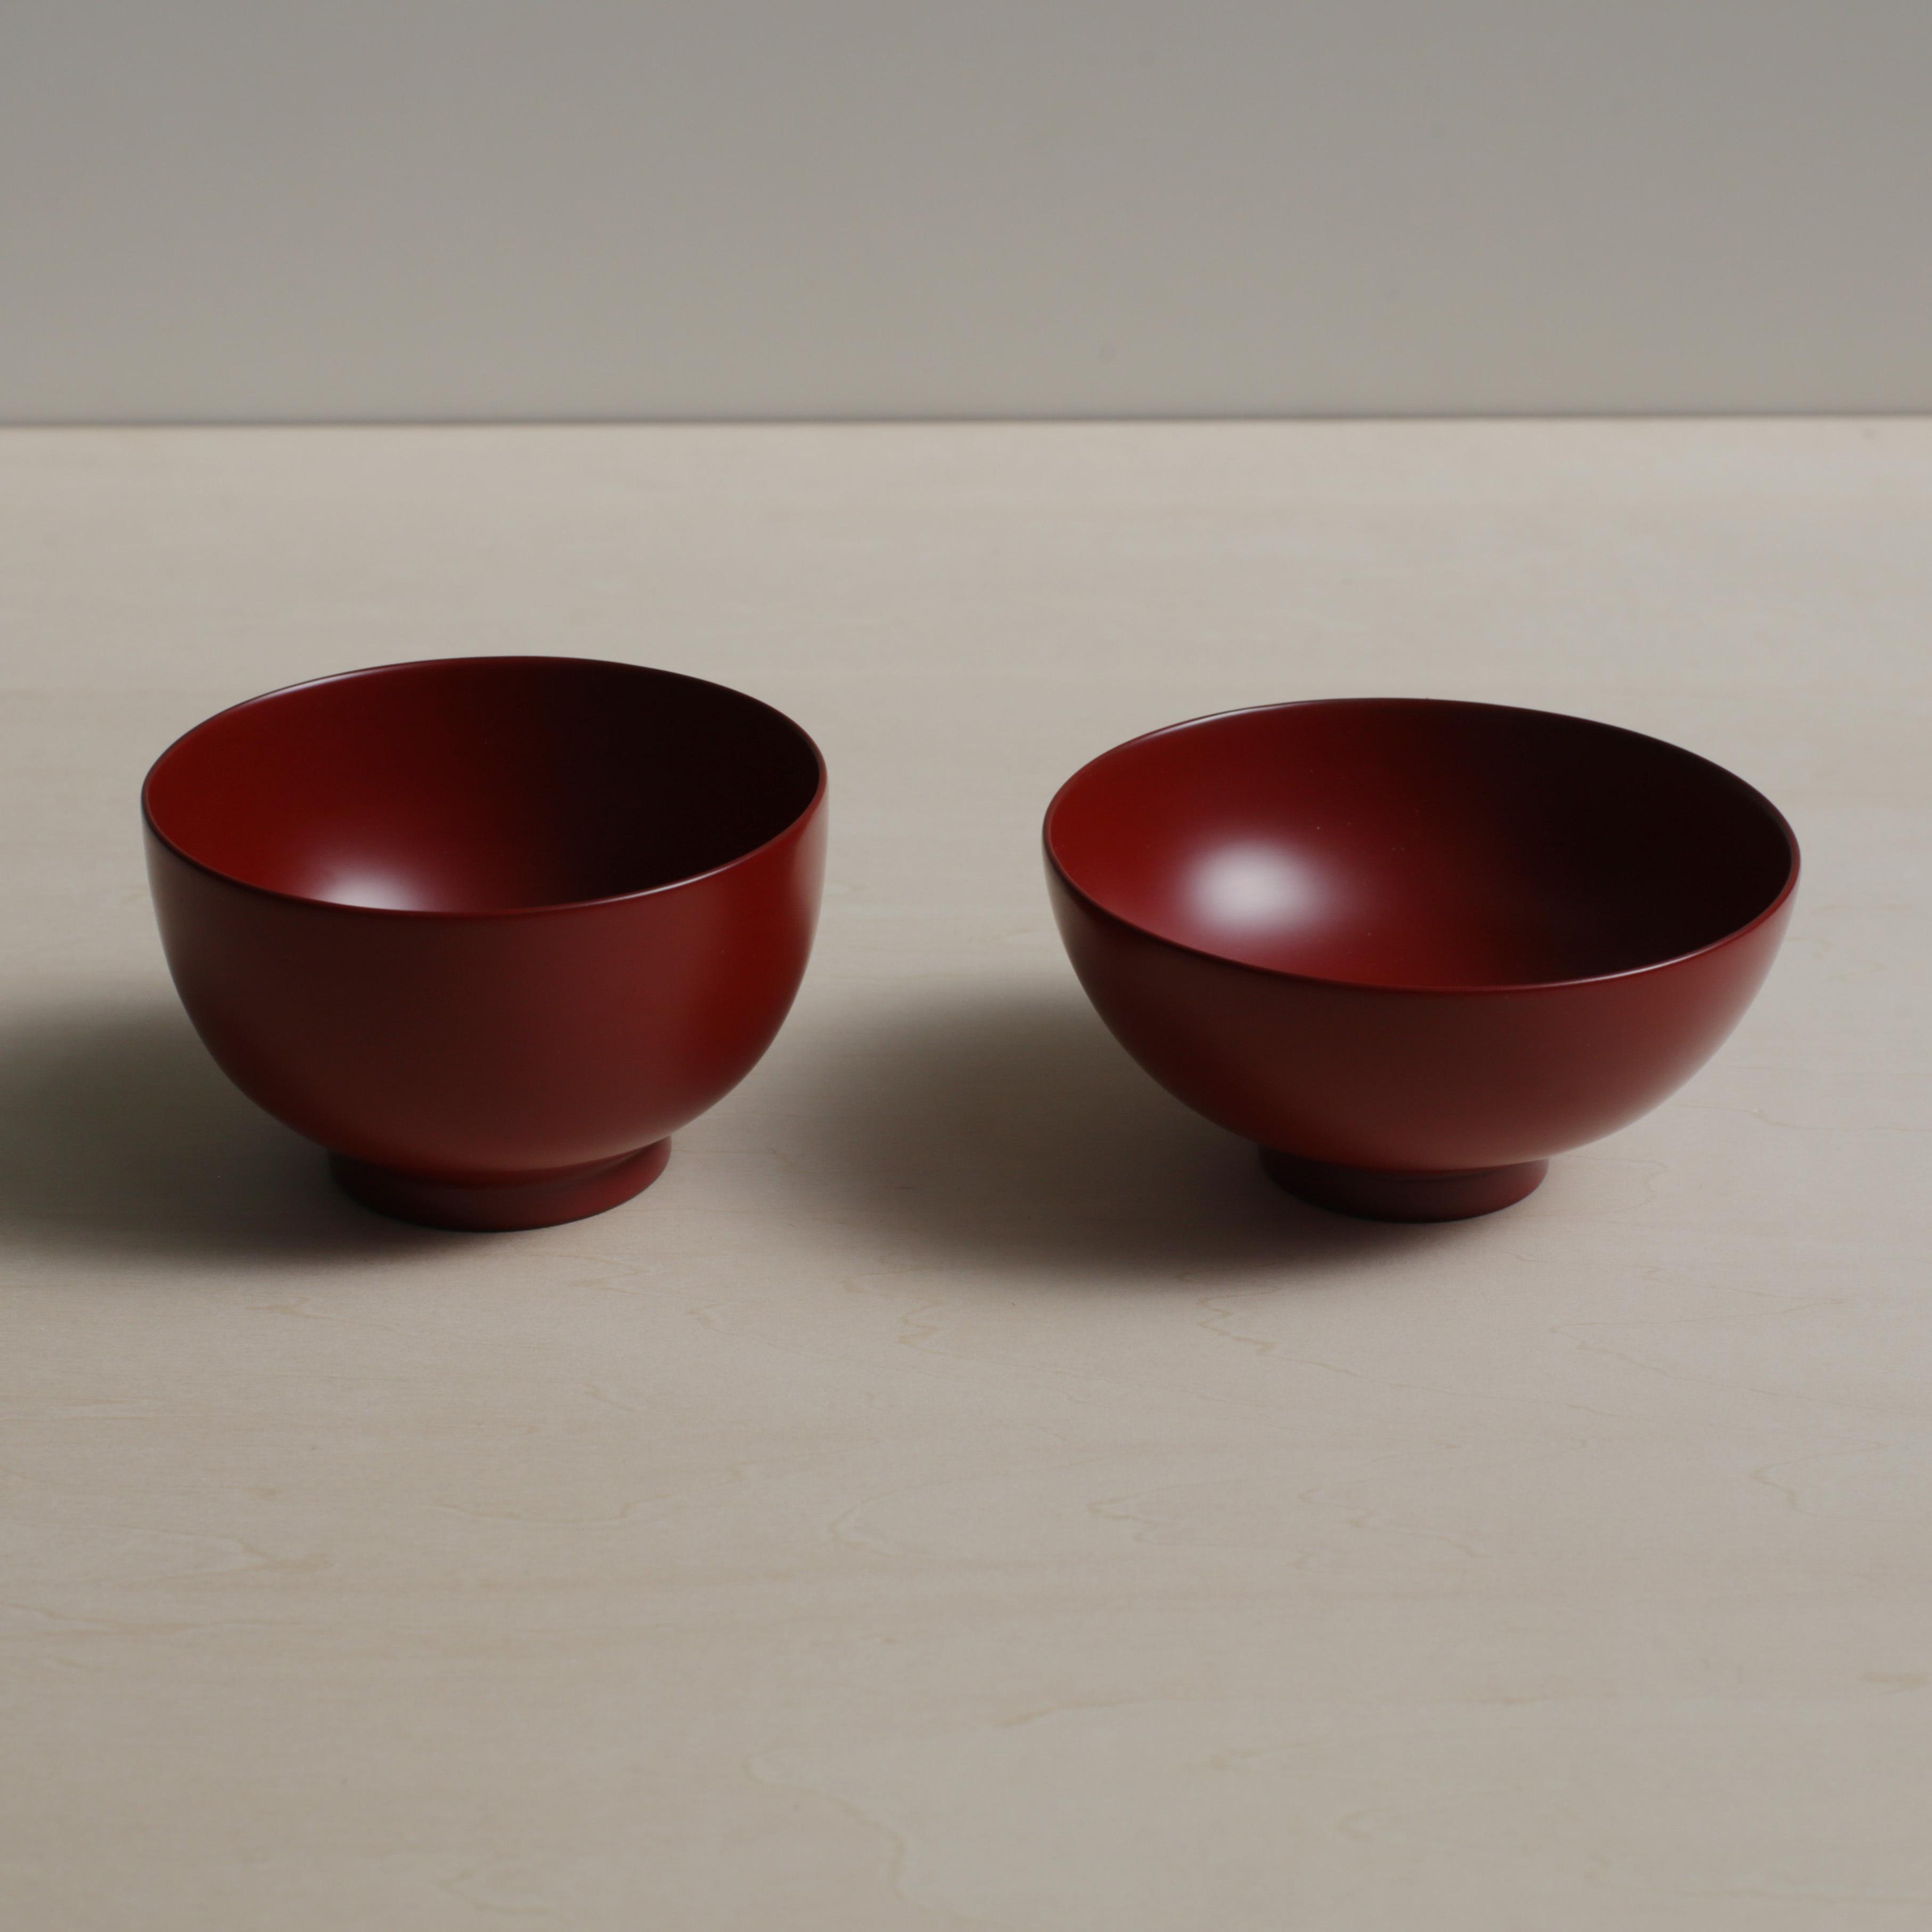 bowl for children set / 子供用椀セット